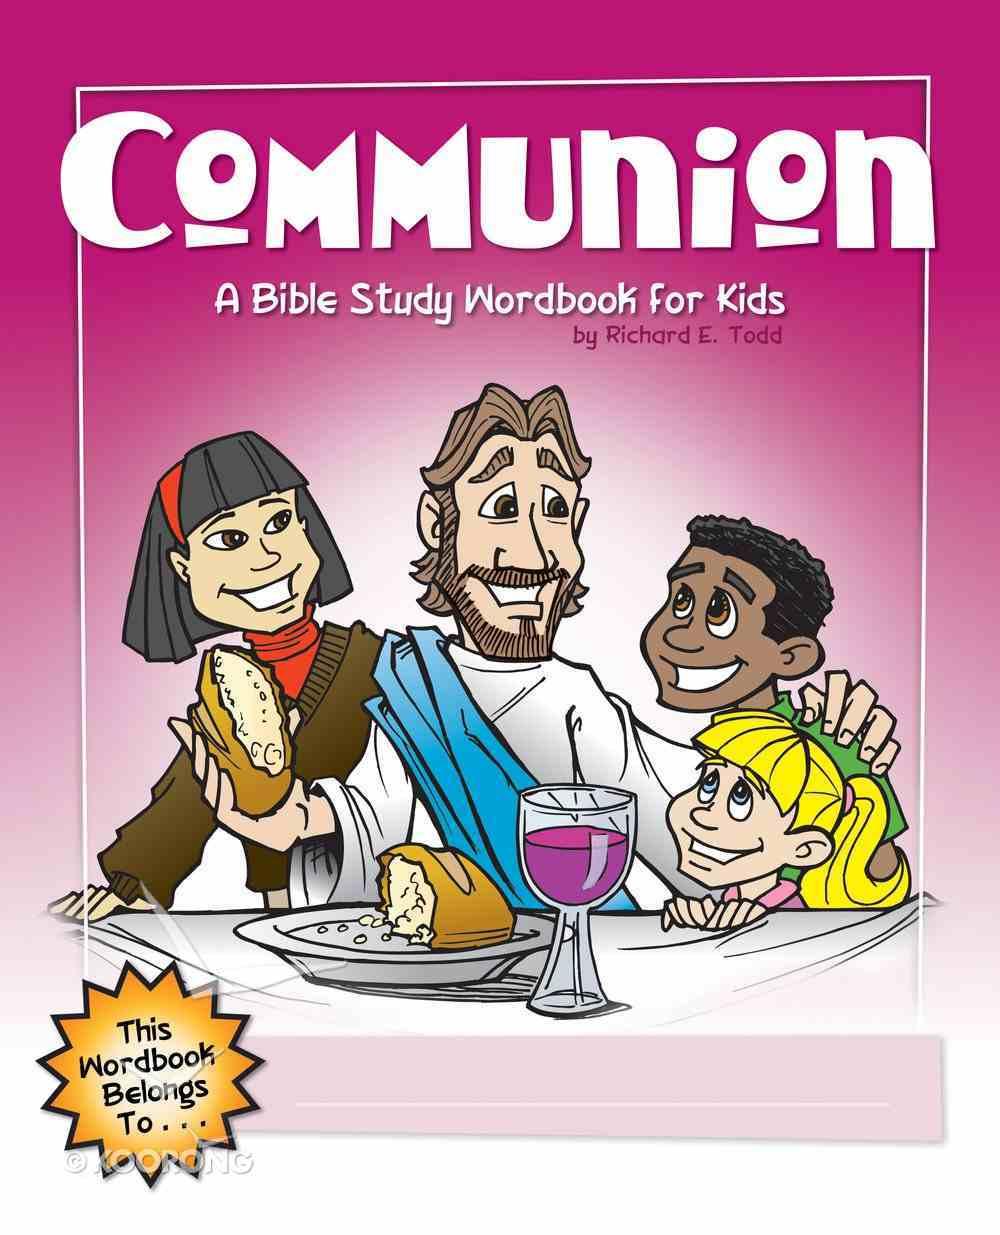 Communion: A Bible Study Wordbook For Kids (Bible Workbook For Kids Series) eBook